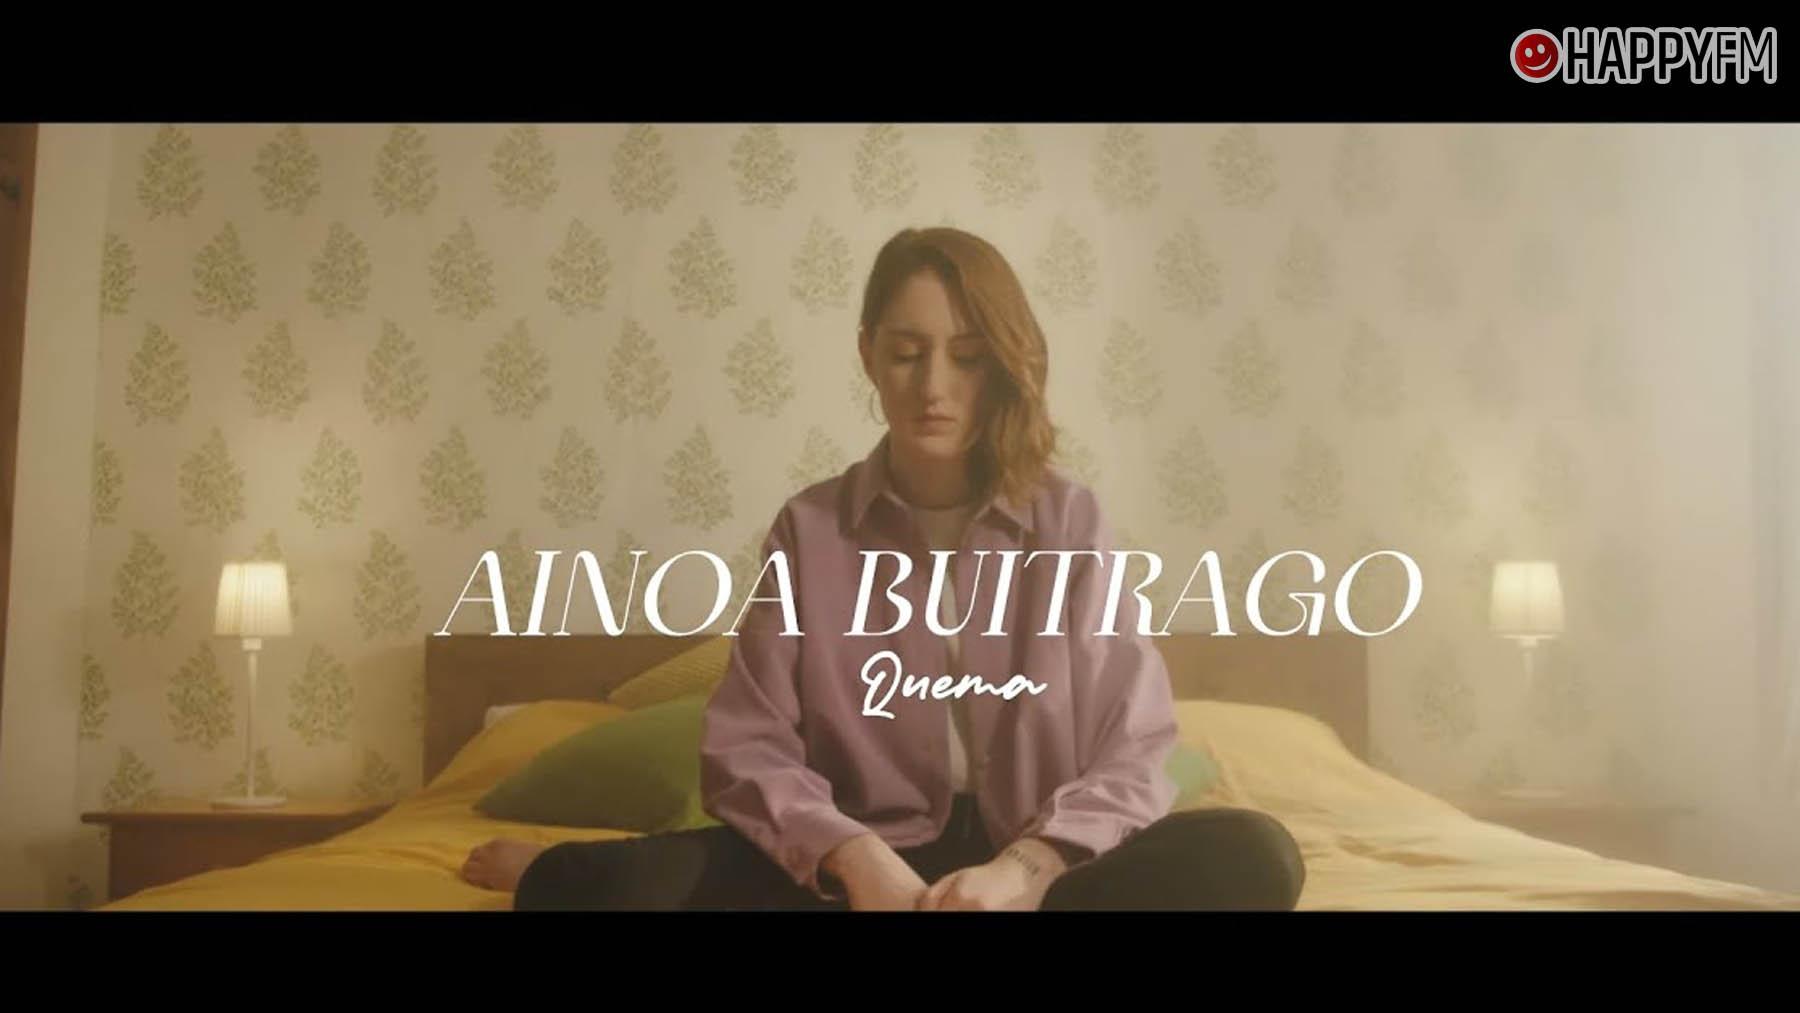 Ainoa Buitrago